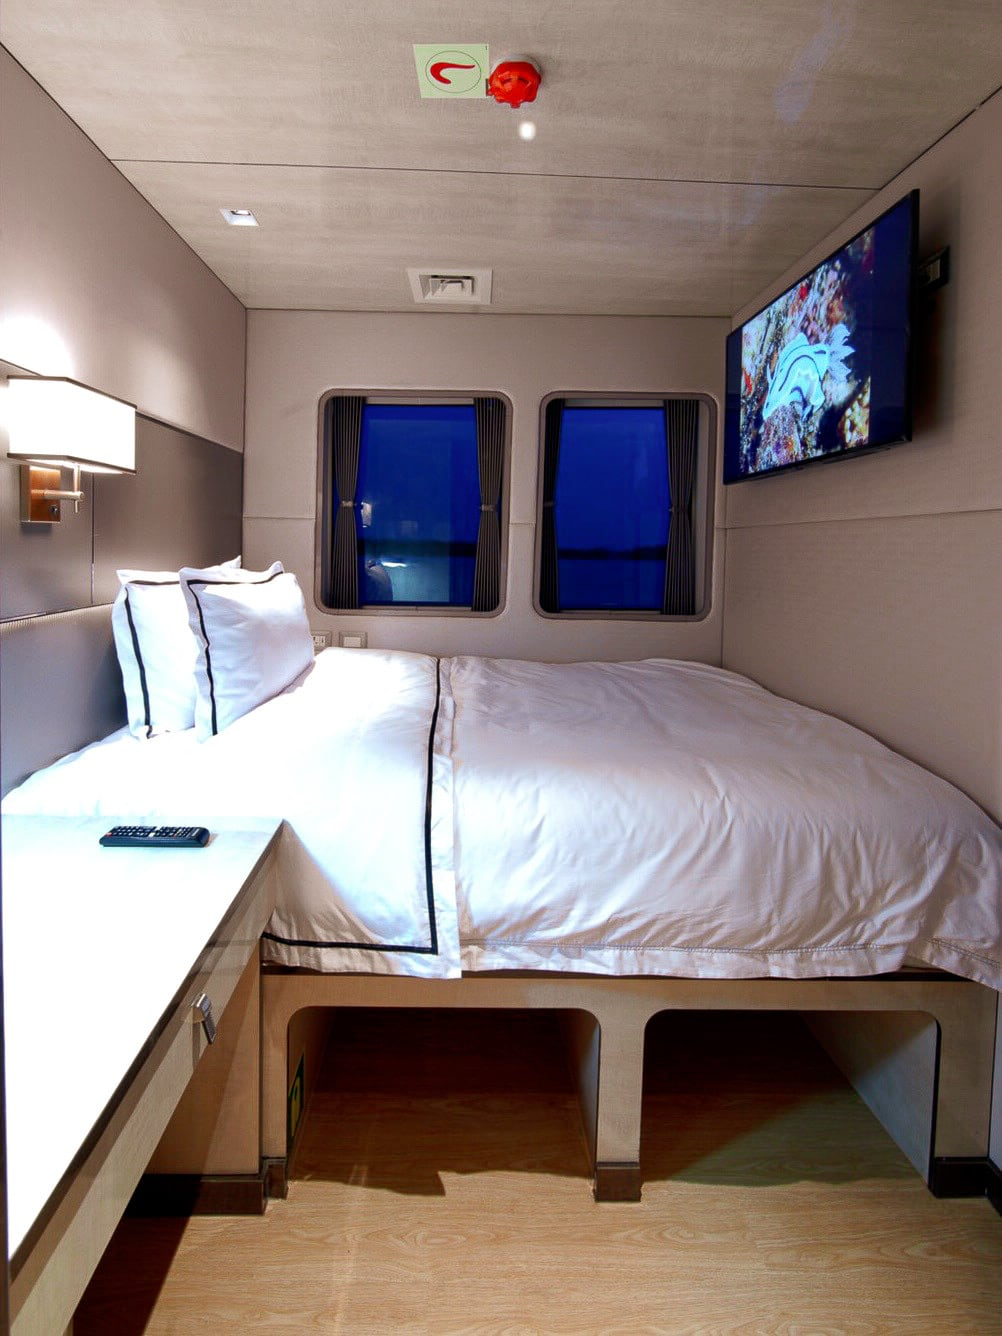 Signature Single Suite - Private cabin on Indonesia dive liveaboard Velocean - no single supplement